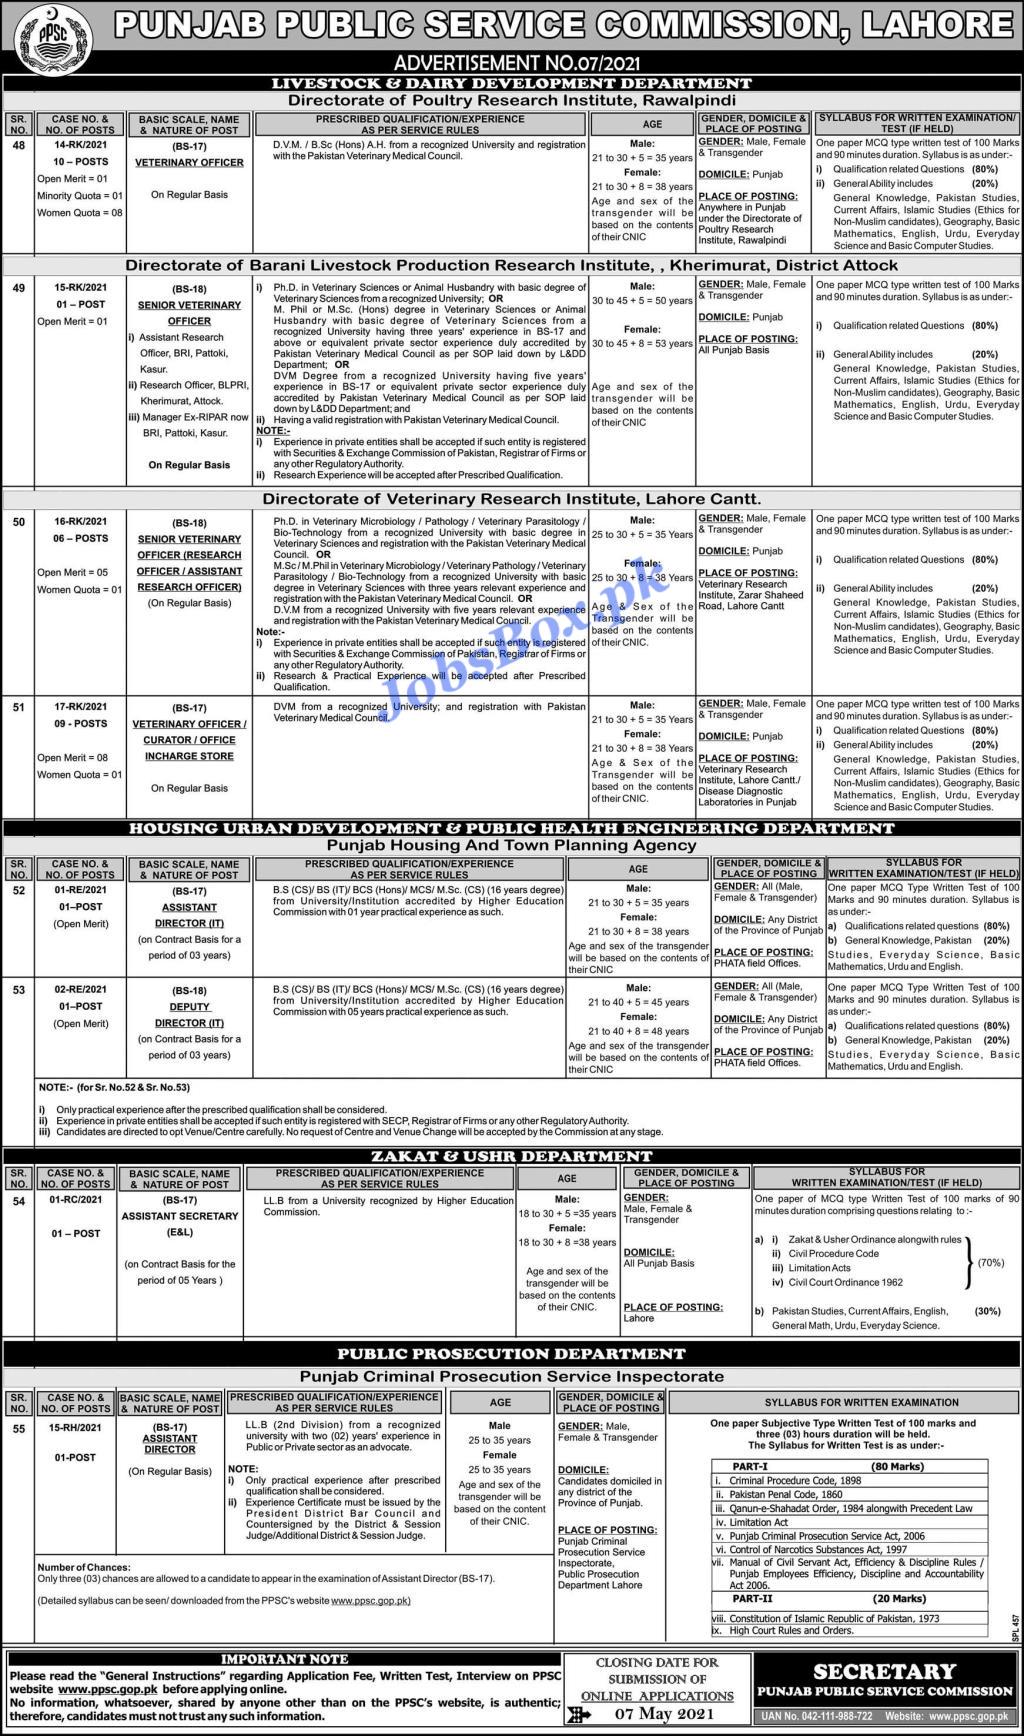 Latest PPSC Jobs April 2021 Advertisement No. 7/2021